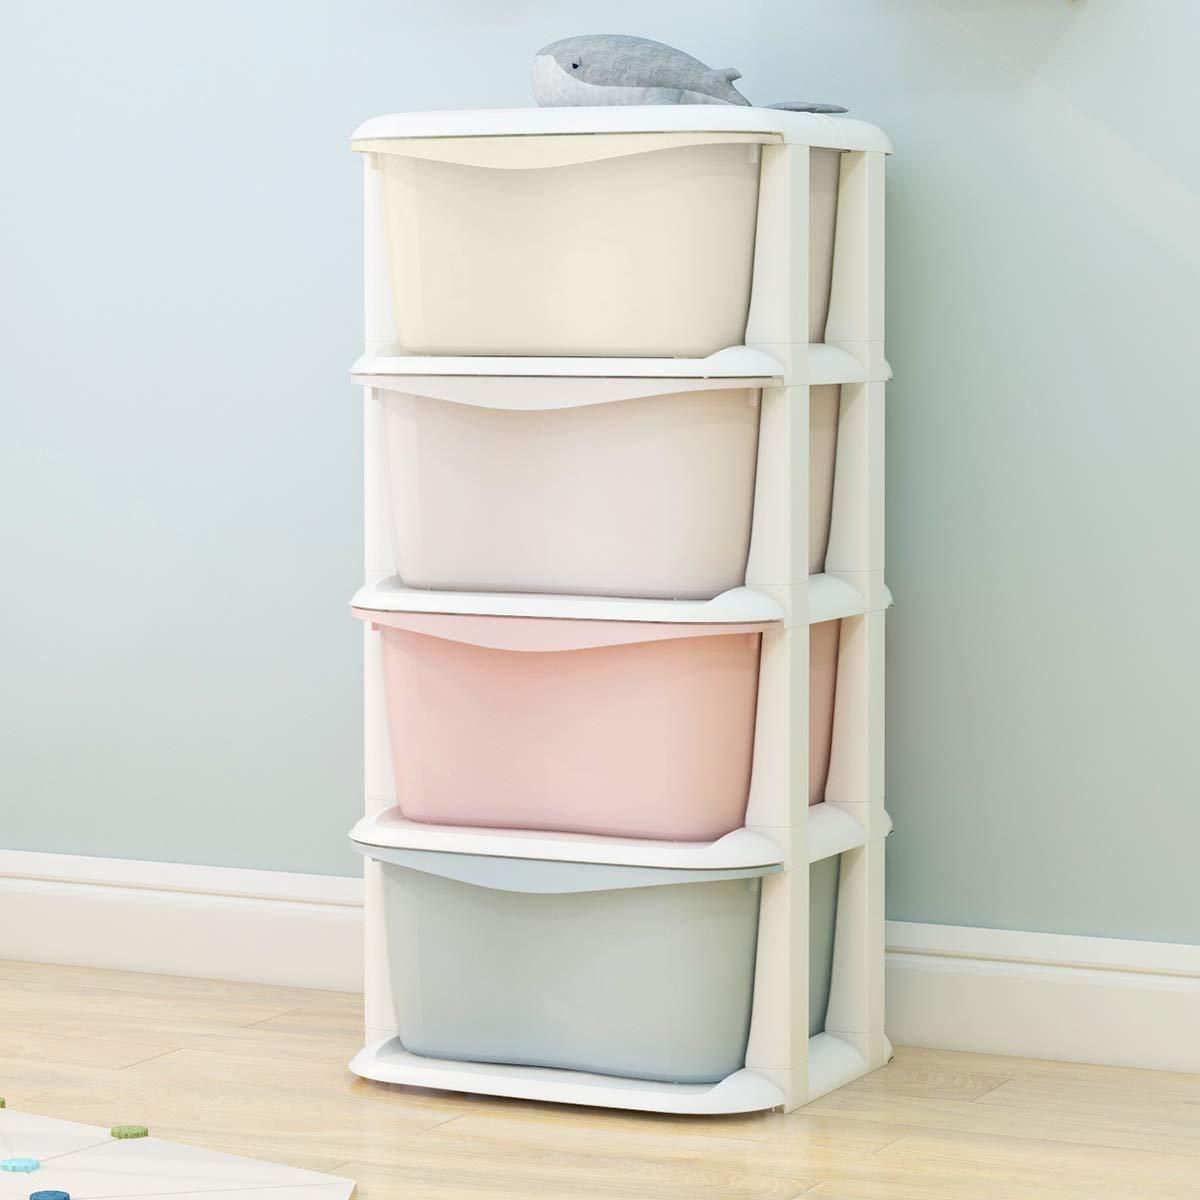 Nafenai Baby Storage Organizer, Cute Multicolor Drawer Storage Cart for Kids Bedroom, 4 Drawers-14.57'' L x 14.96'' W x 31.50'' H